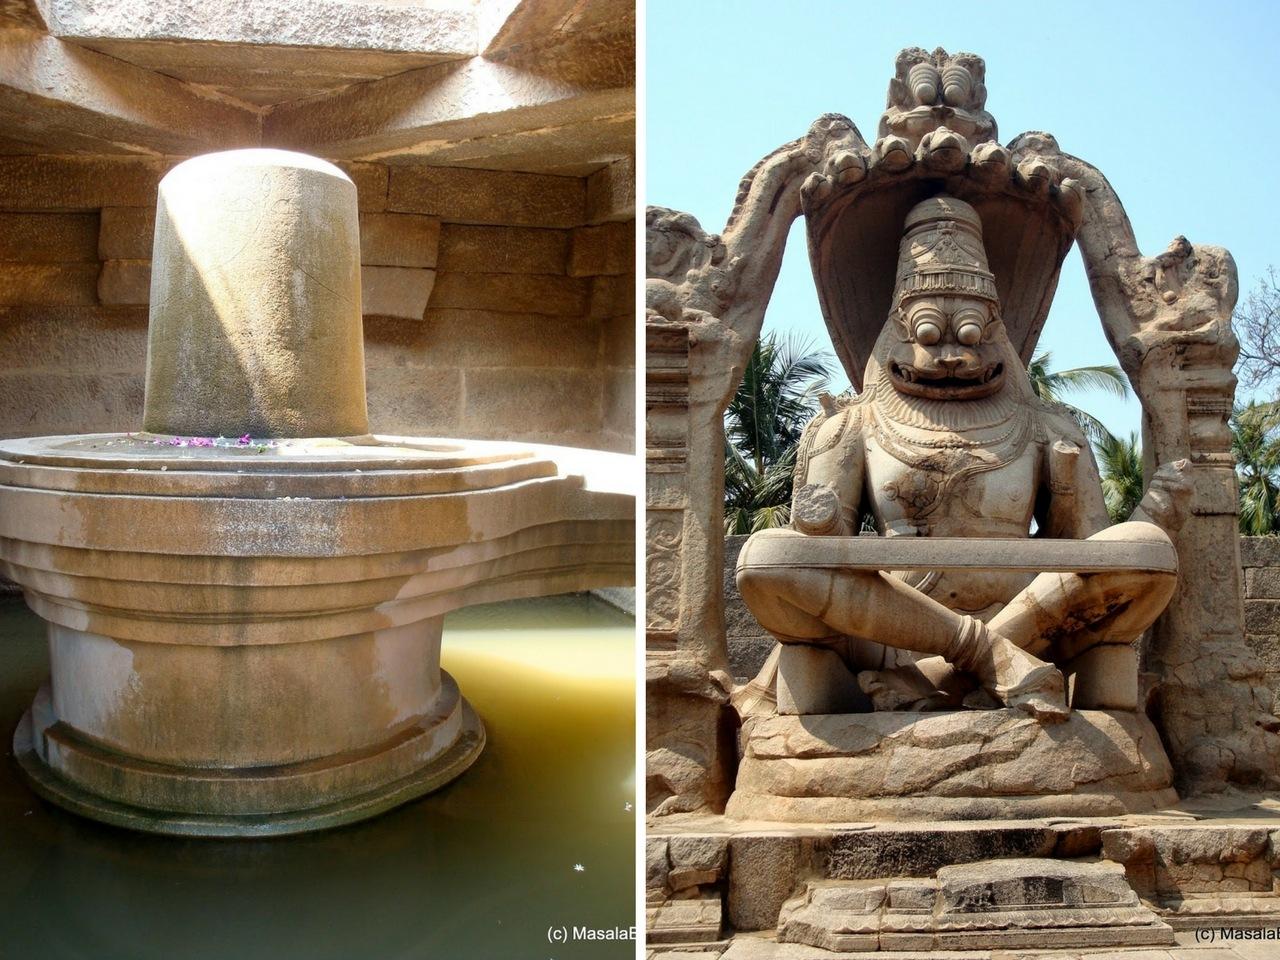 Badavalinga & Narasimha Murthy